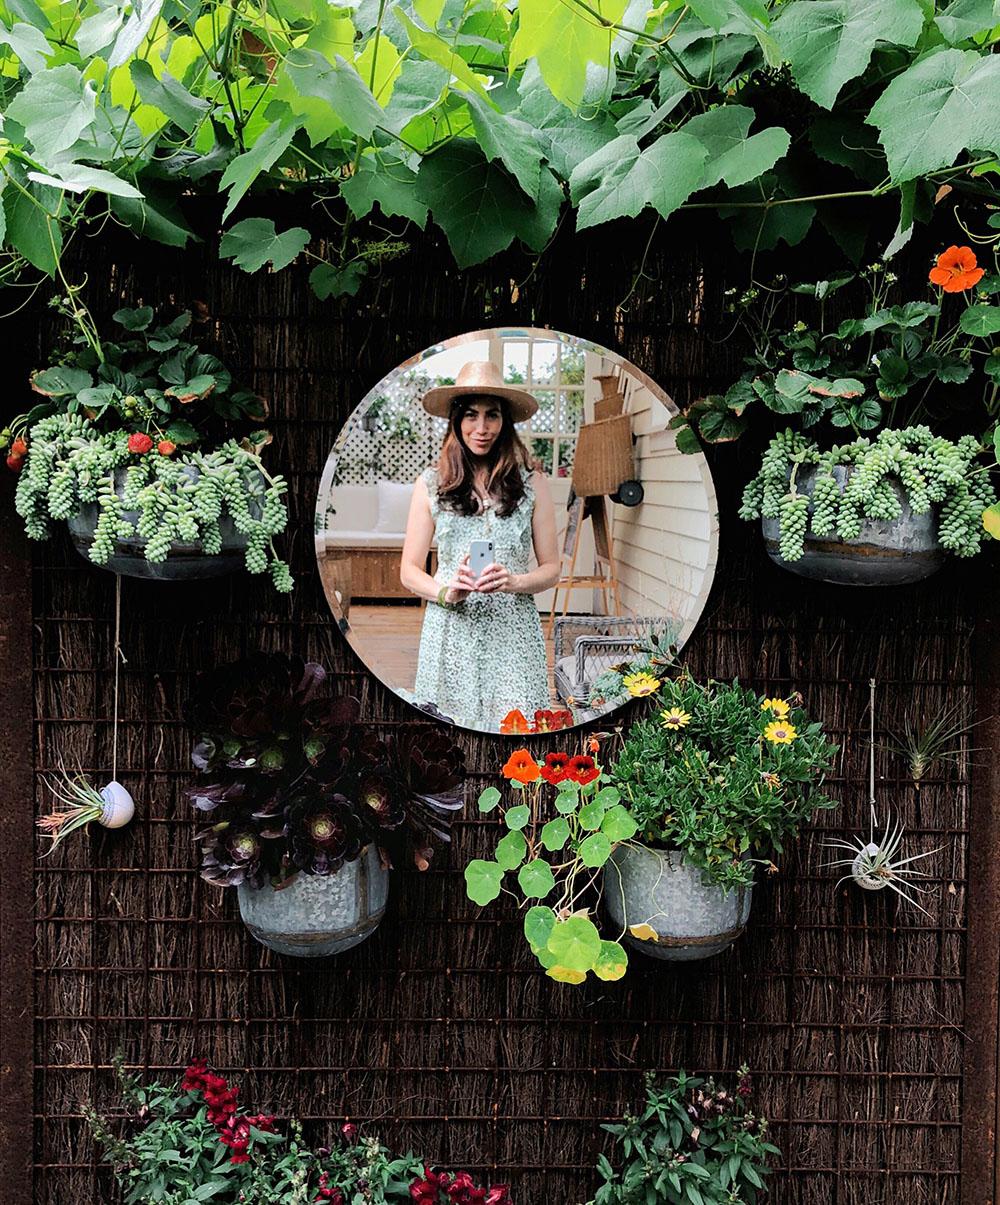 whitneyleighmorris_tinycanalcottage_garden_mirror_2.JPG